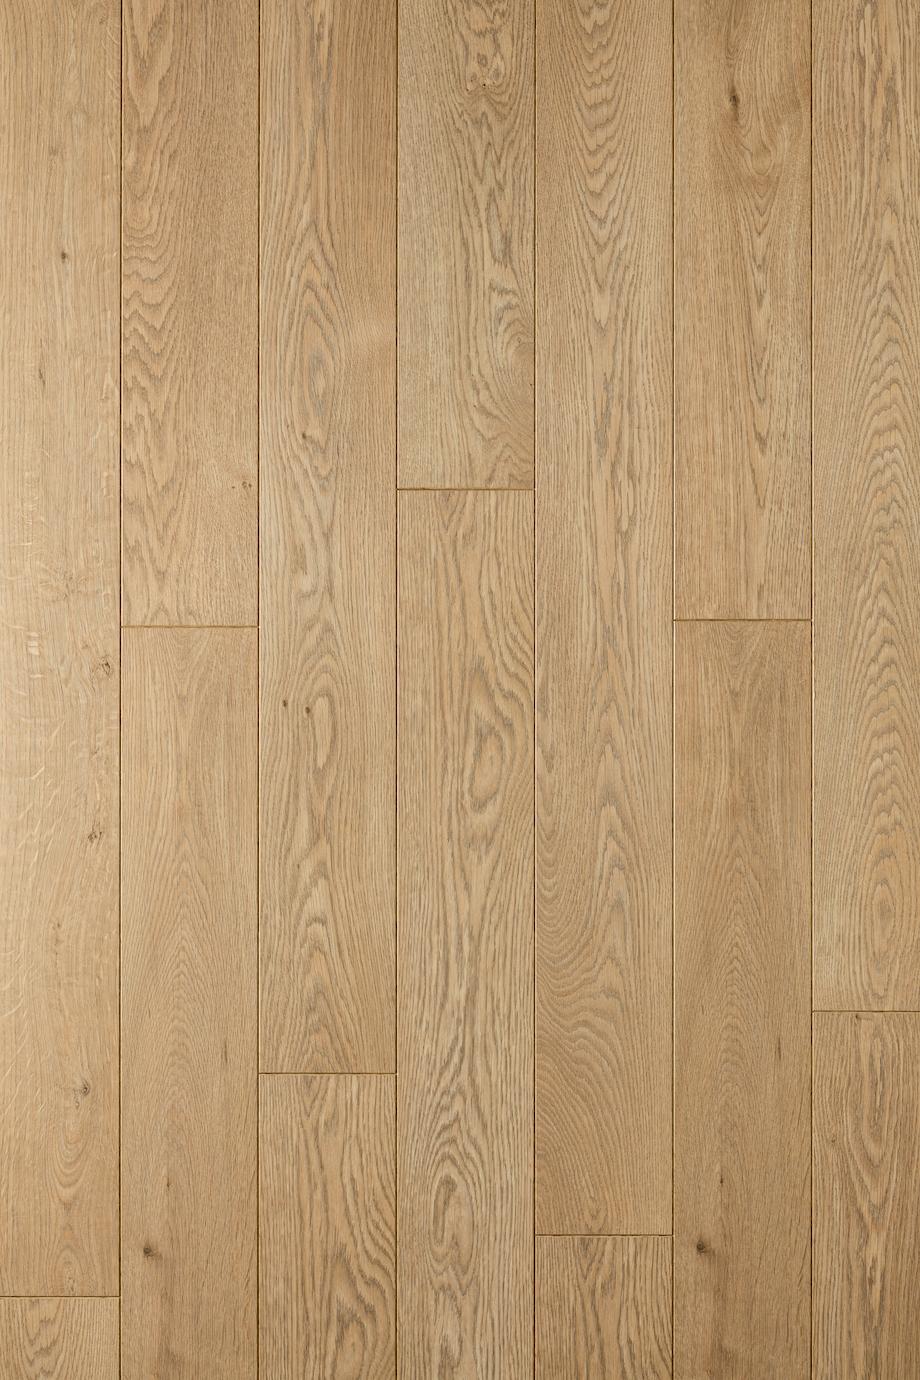 Ламинат Clix Floor Charm 161 Дуб Ваниль 1261х133х12мм 8шт/уп. (1,342м2) 4V, 33 класс